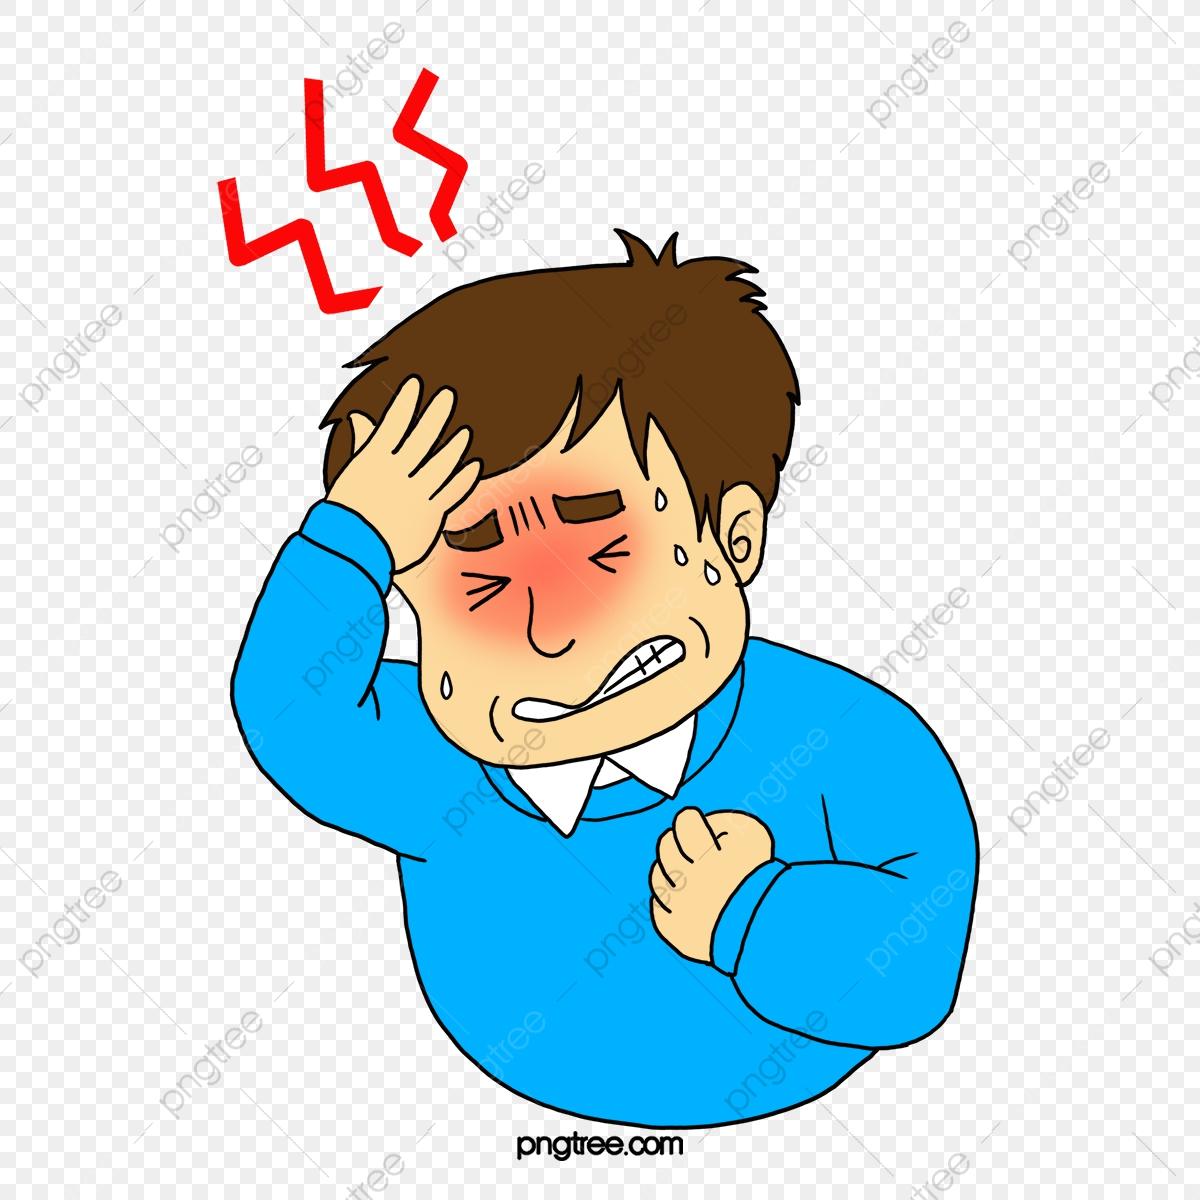 A Man With A Headache, Man Clipart, Man, Pain PNG Transparent.